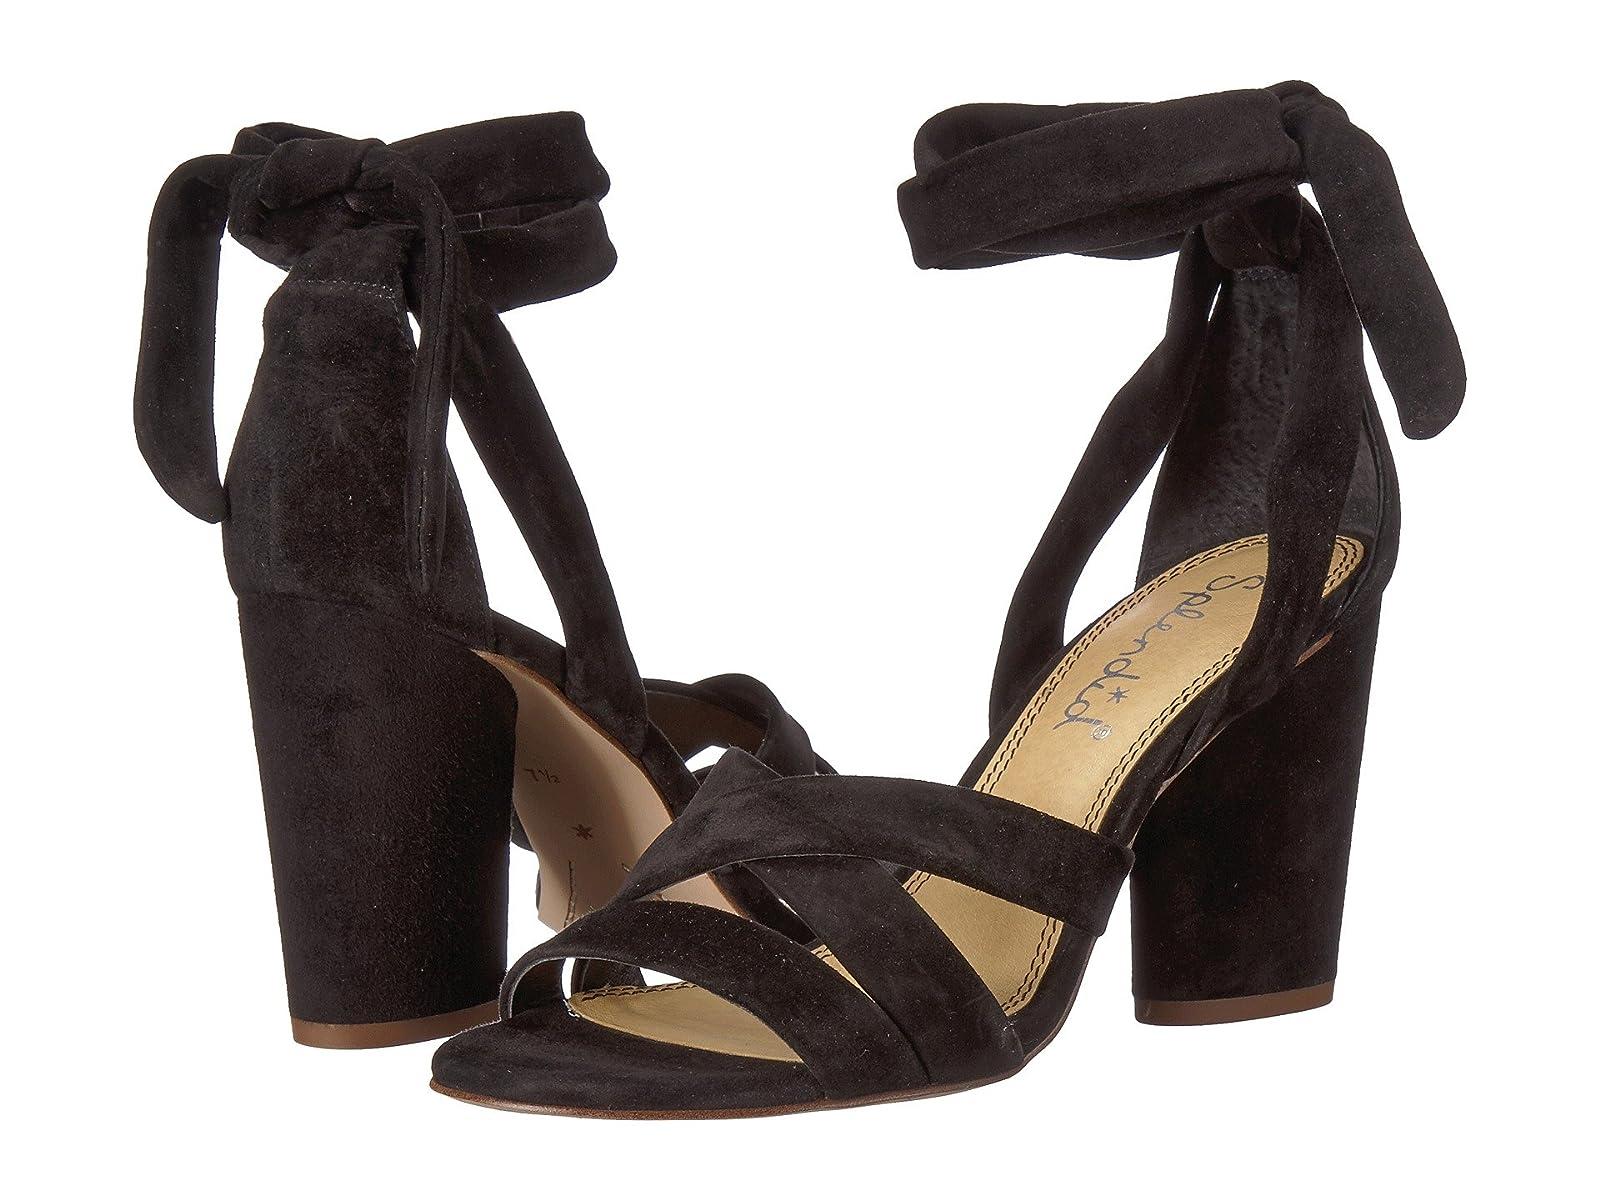 Splendid FergieCheap and distinctive eye-catching shoes